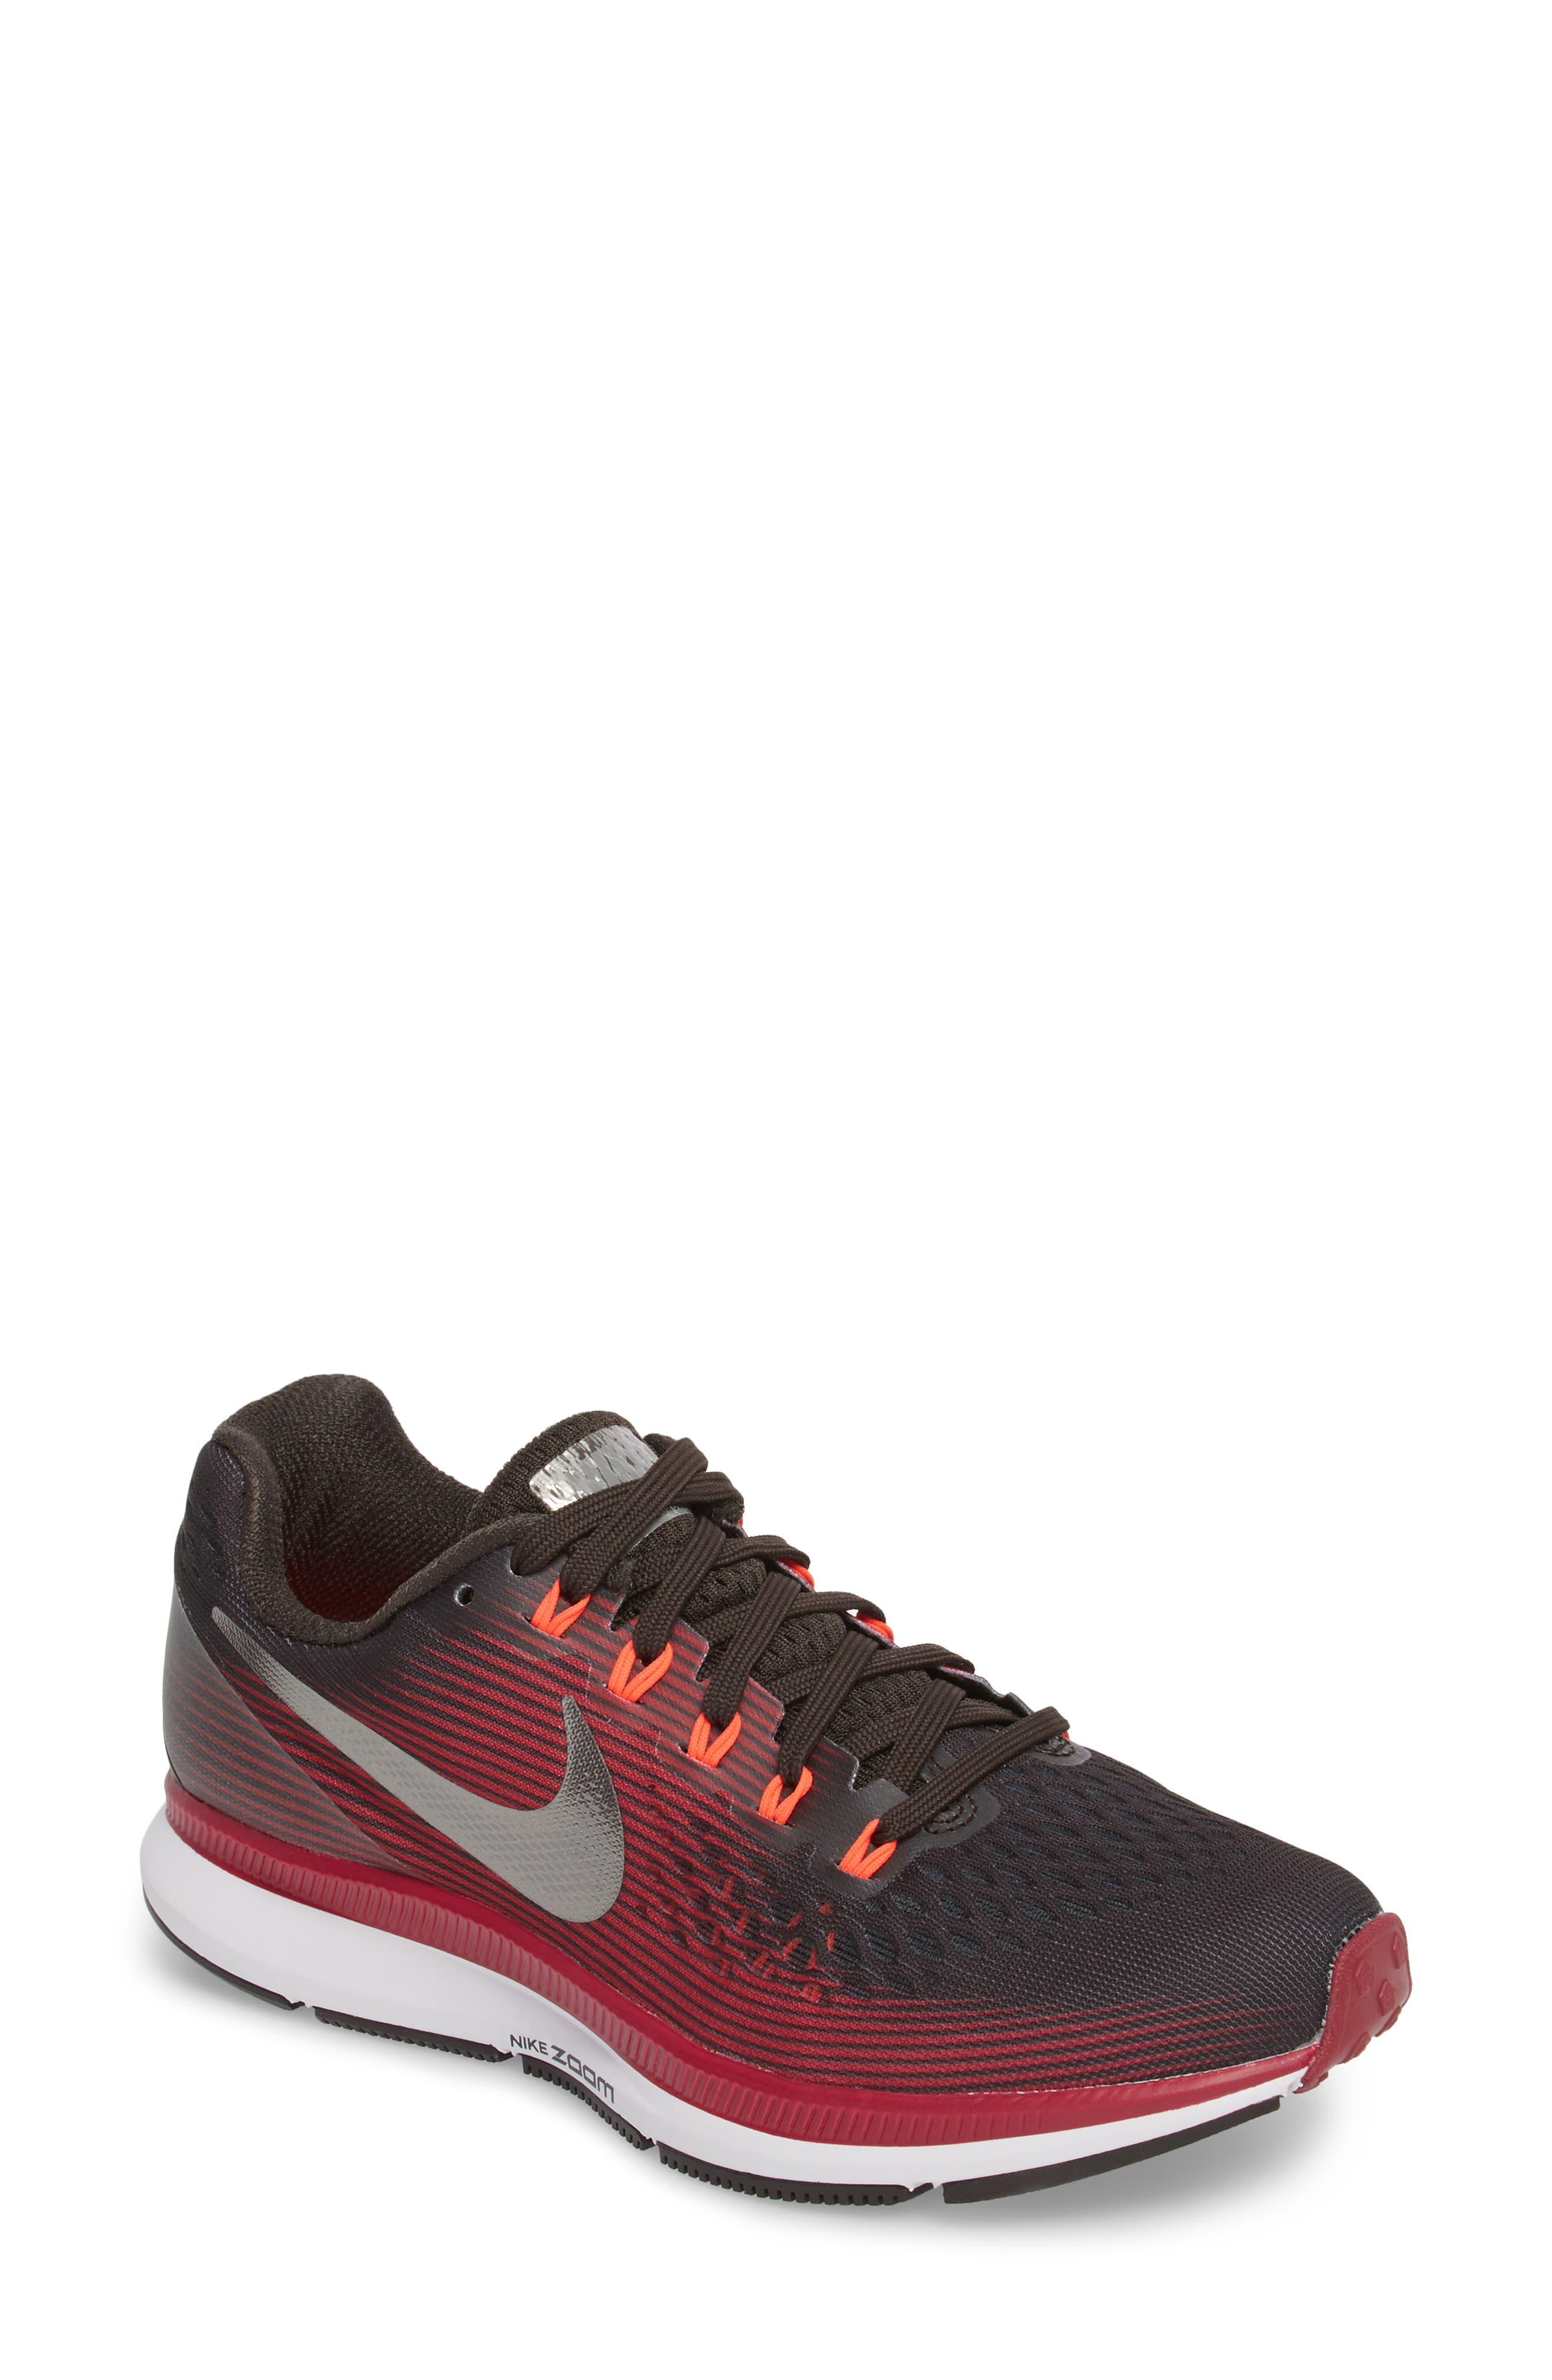 Air Zoom Pegasus 34 Gem Running Shoe,                         Main,                         color, Shadow Brown/ Pewter